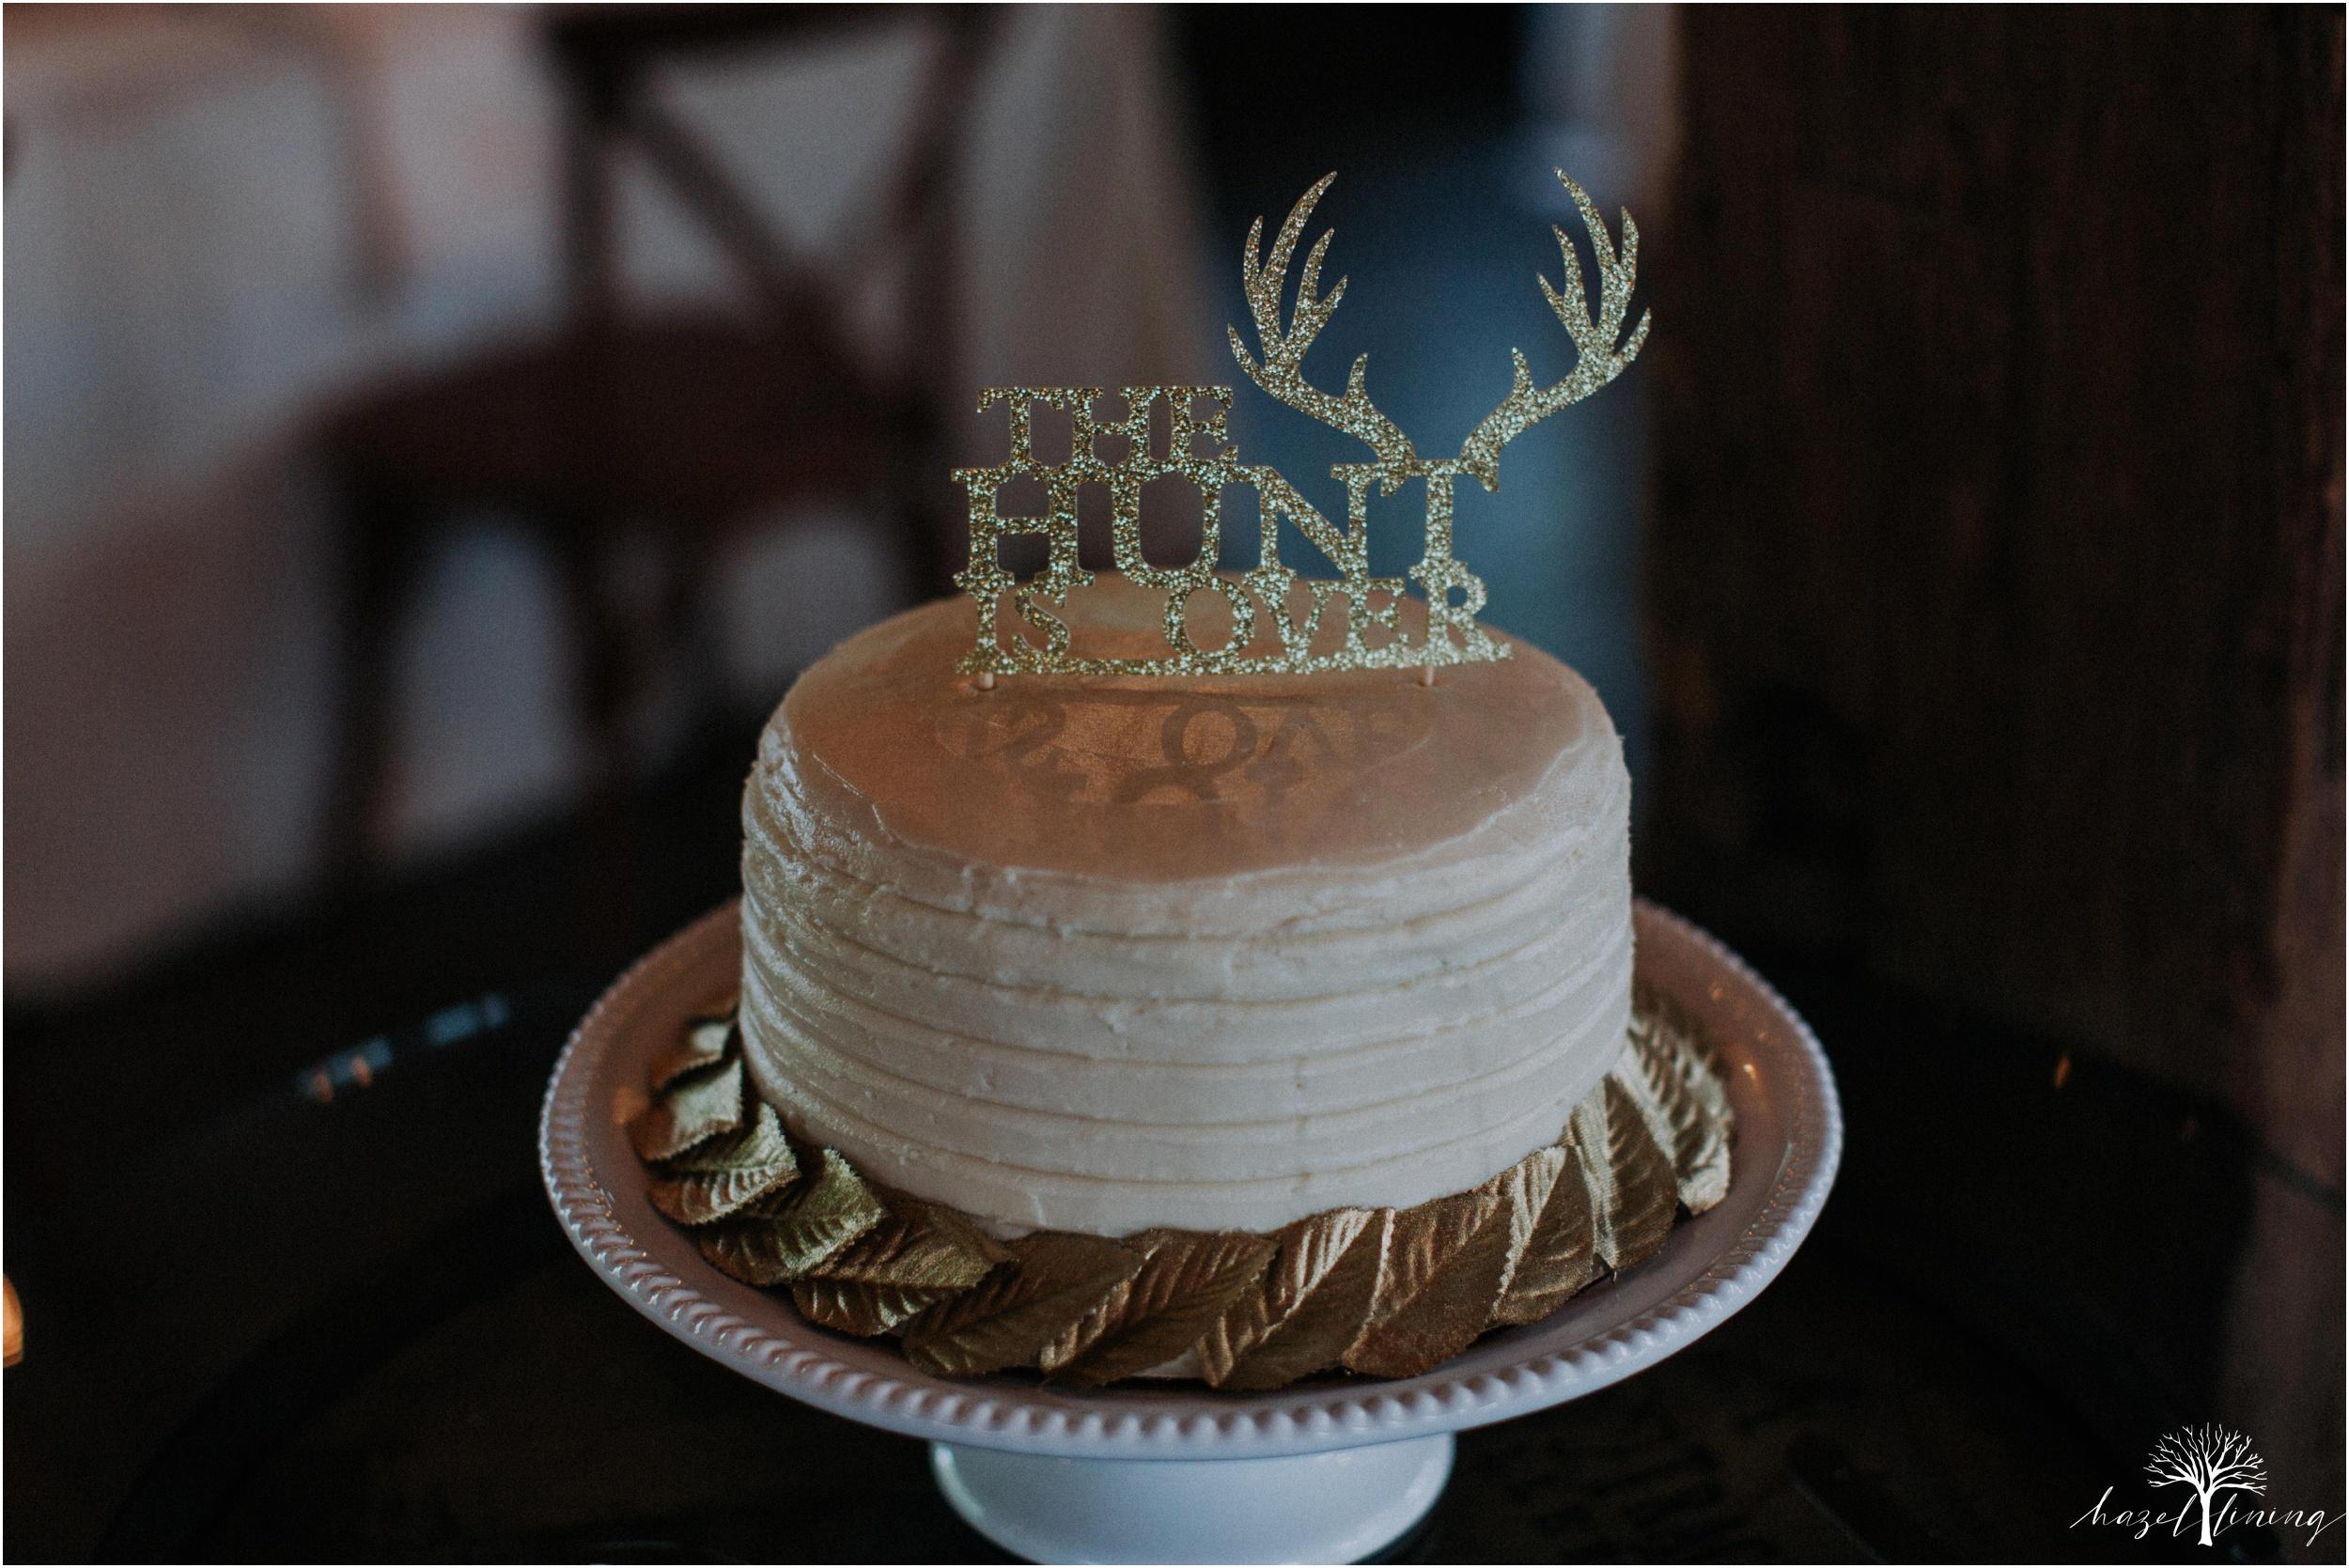 hazel-lining-travel-wedding-elopement-photography-lisa-landon-shoemaker-the-farm-bakery-and-events-bucks-county-quakertown-pennsylvania-summer-country-outdoor-farm-wedding_0140.jpg